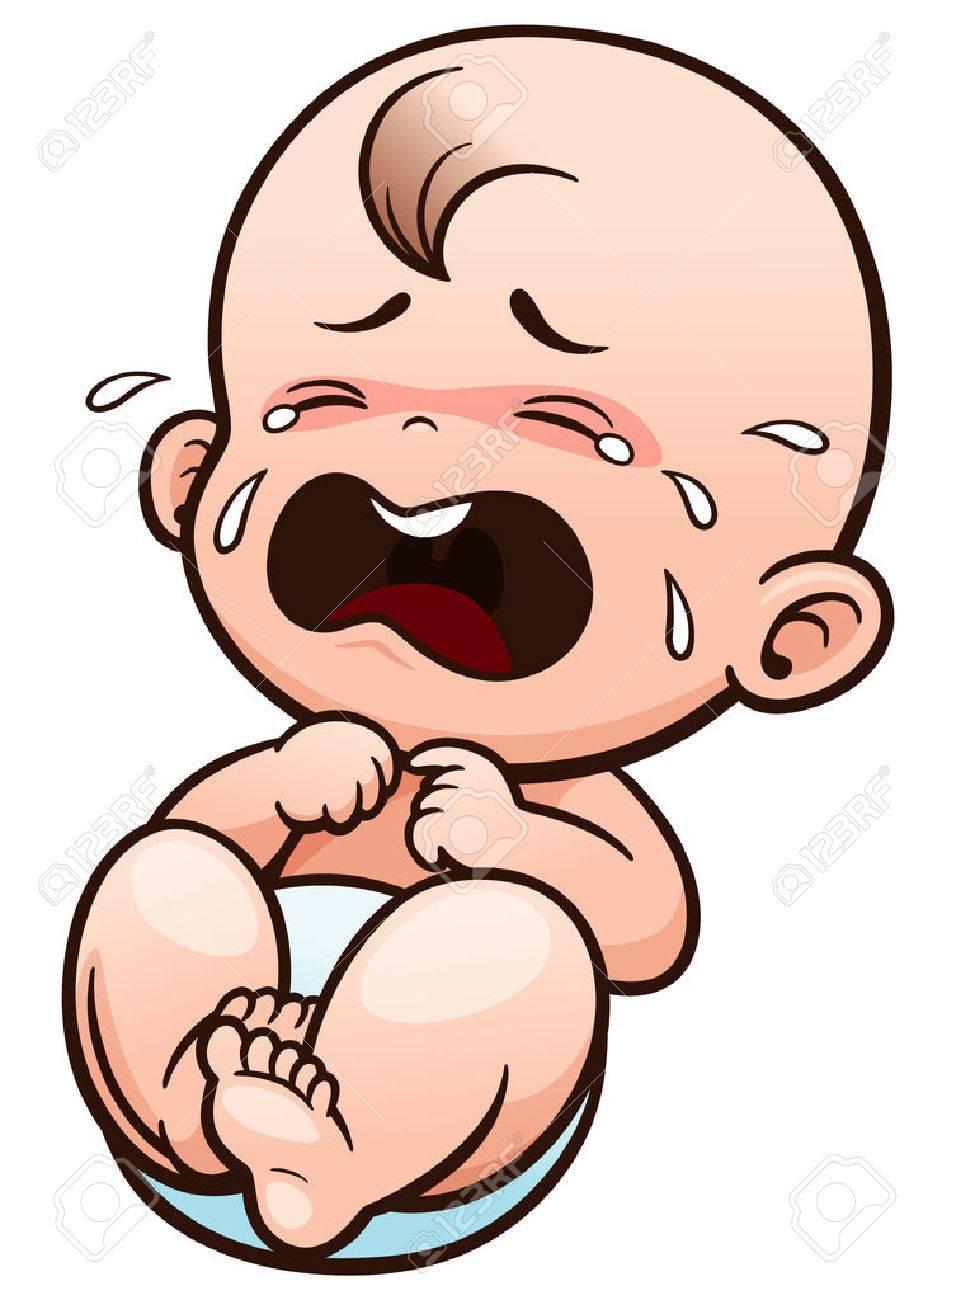 Vector Illustration of Cartoon Baby crying - 66380169